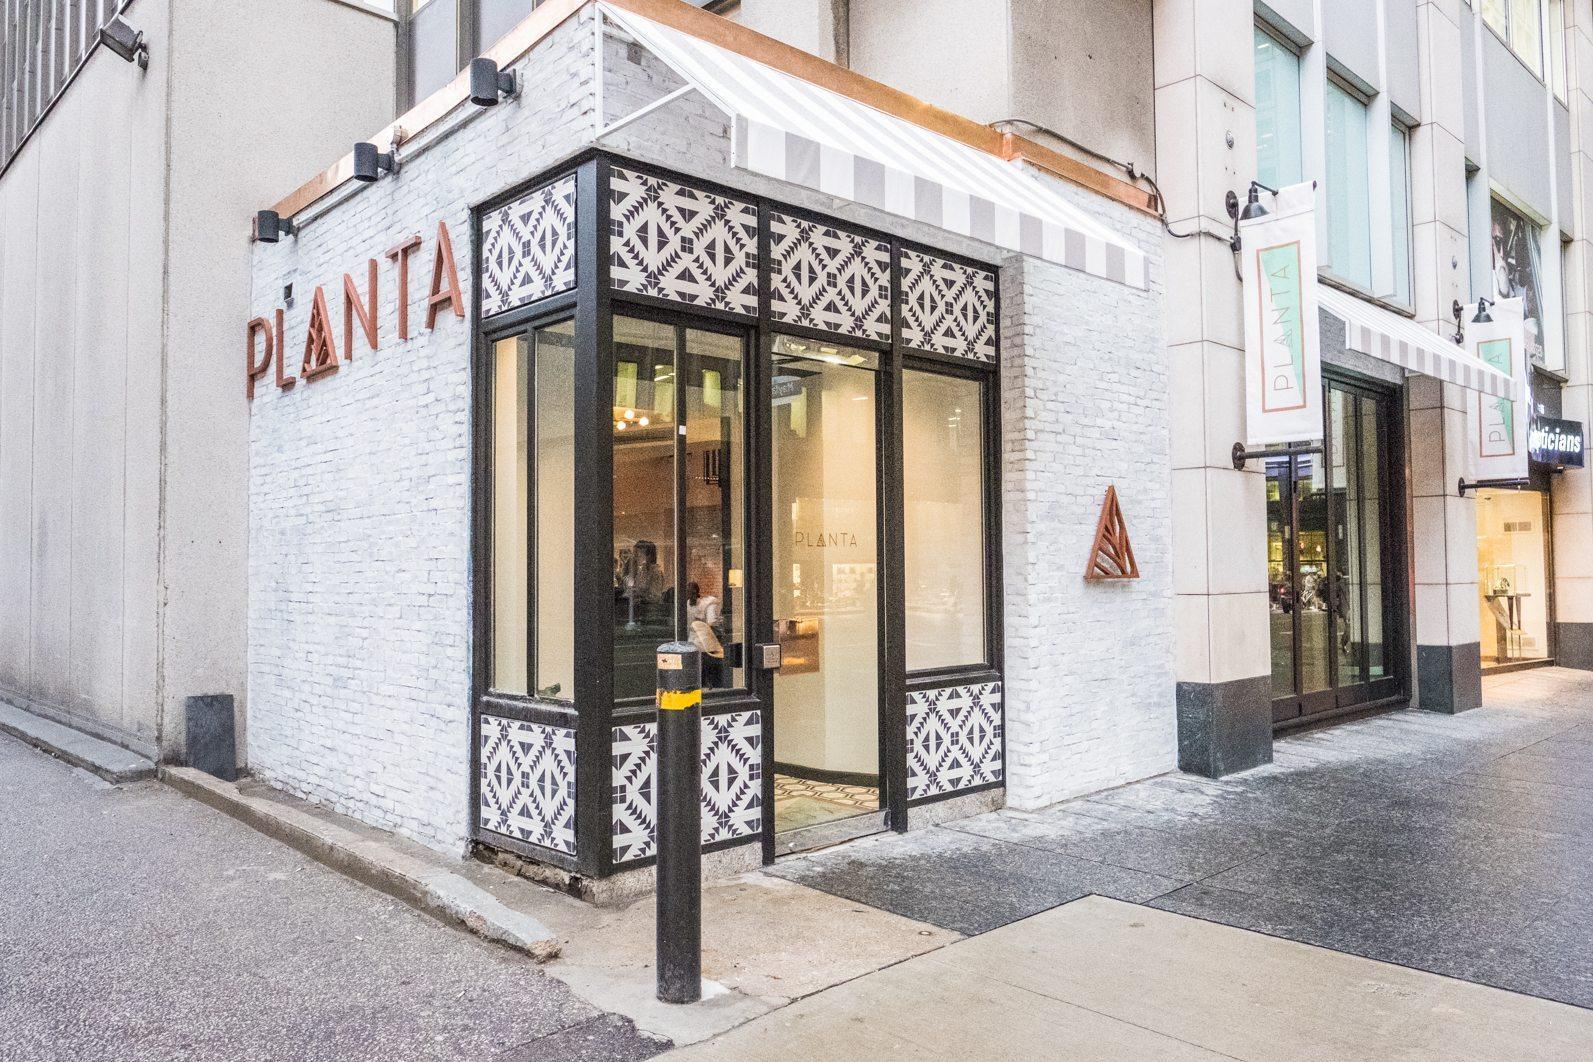 toronto-restaurants-planta-vegetarian-the-chase-david-lee-yorkville-exterior